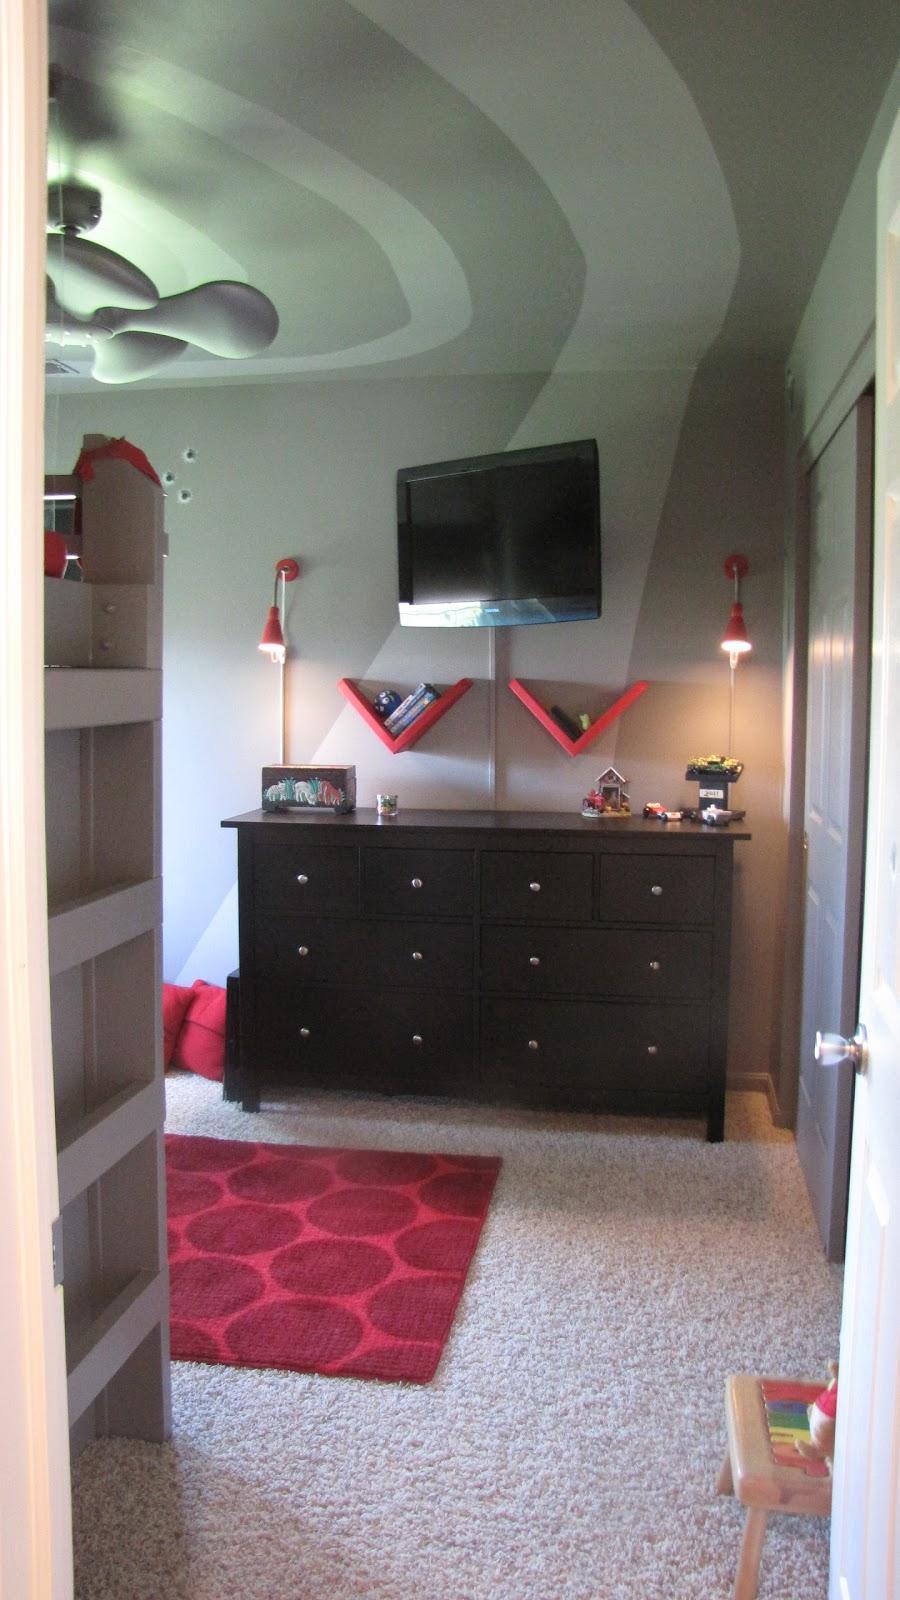 Home girl decor tween spy room - 10 by 10 room ...